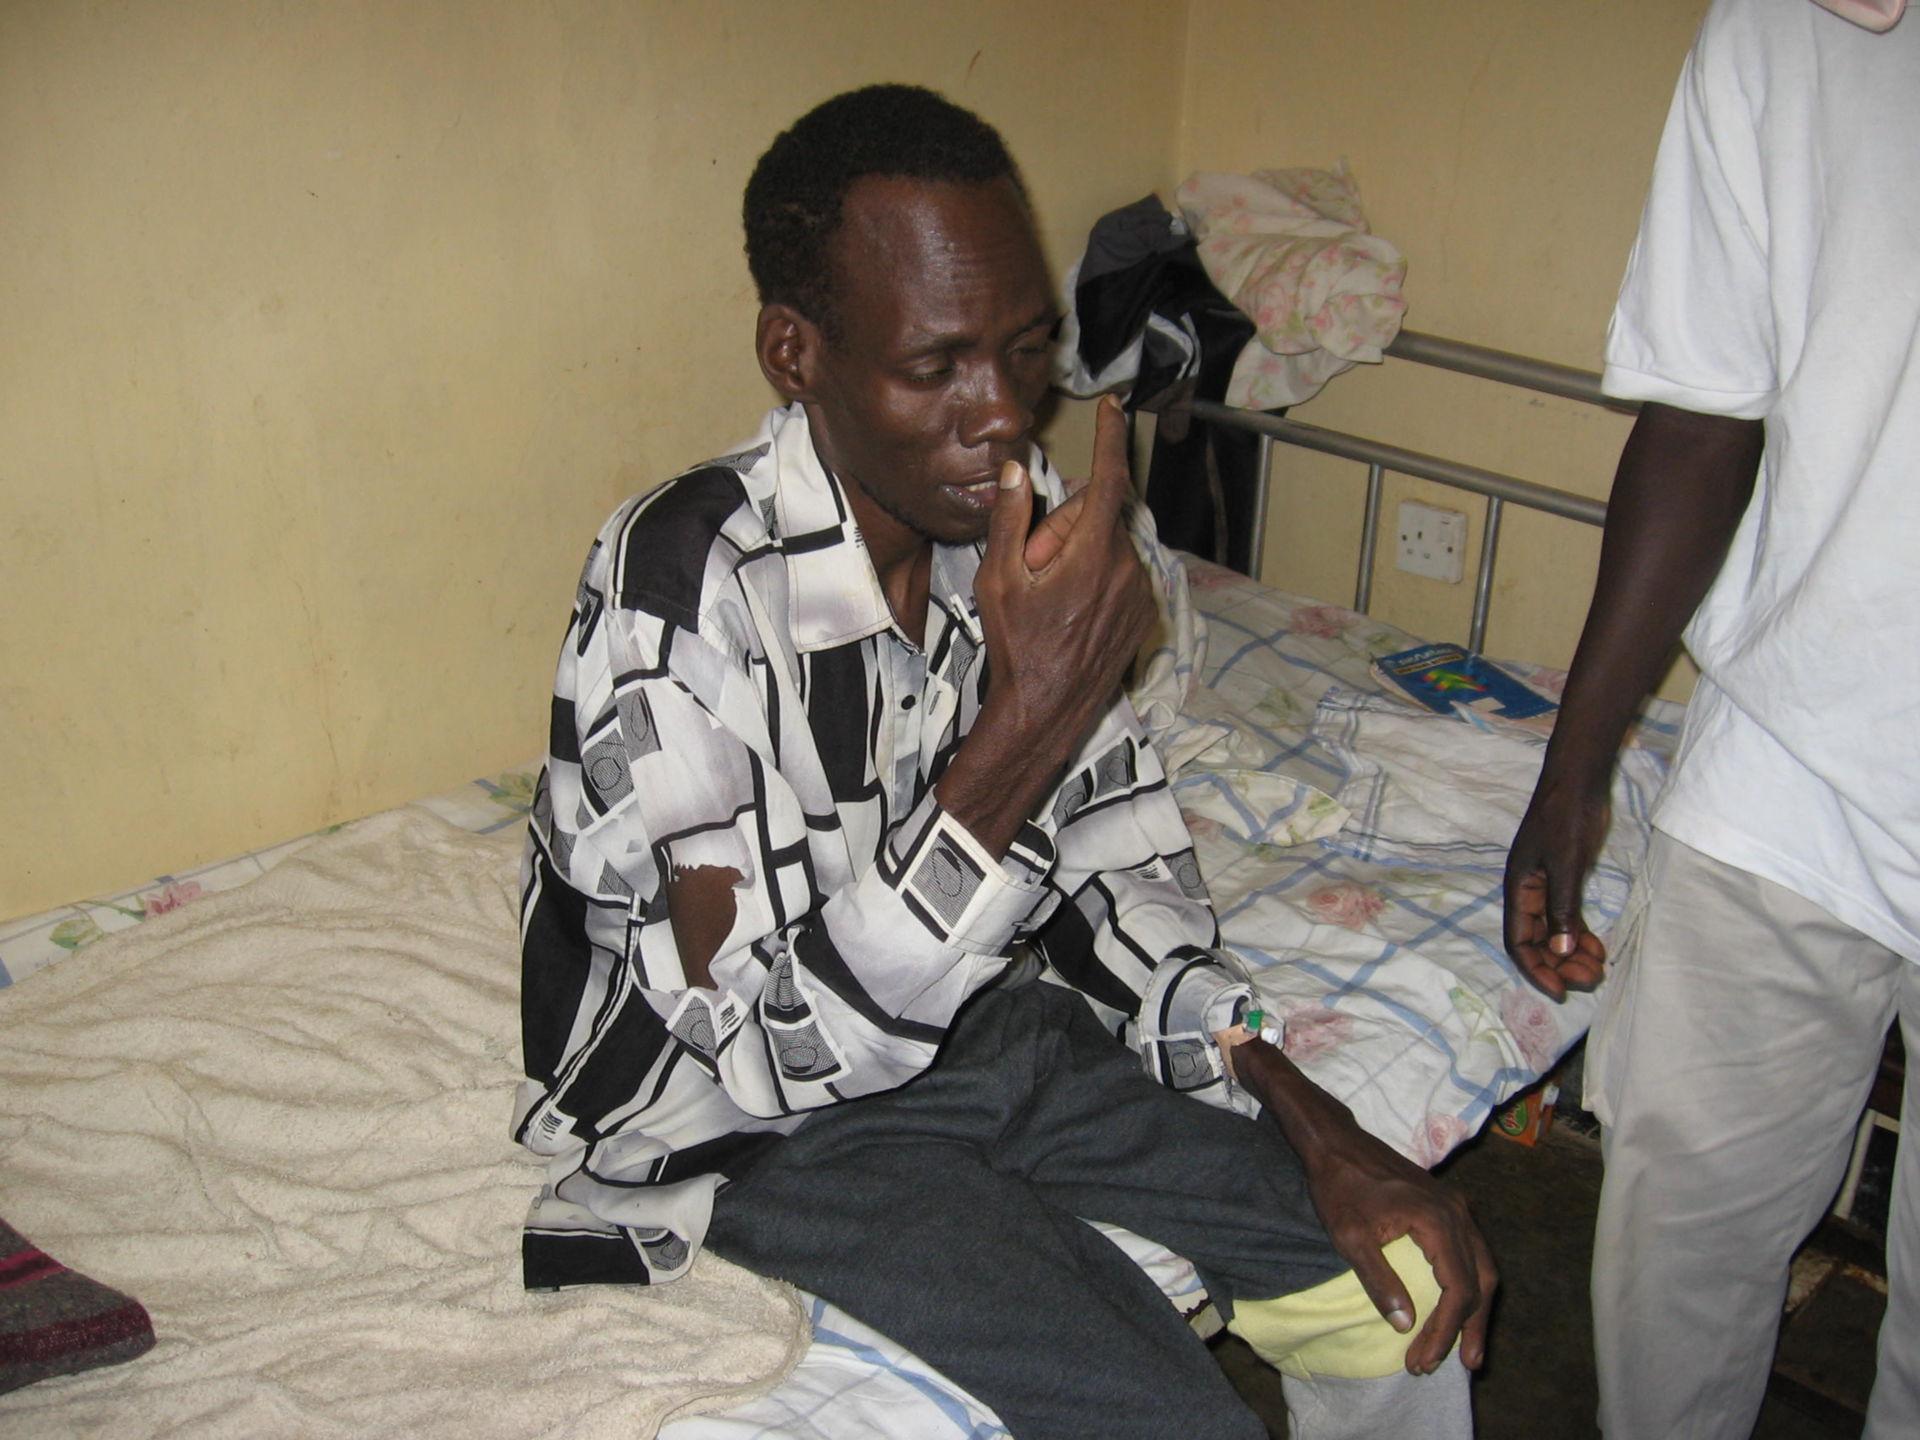 Patient from Uganda